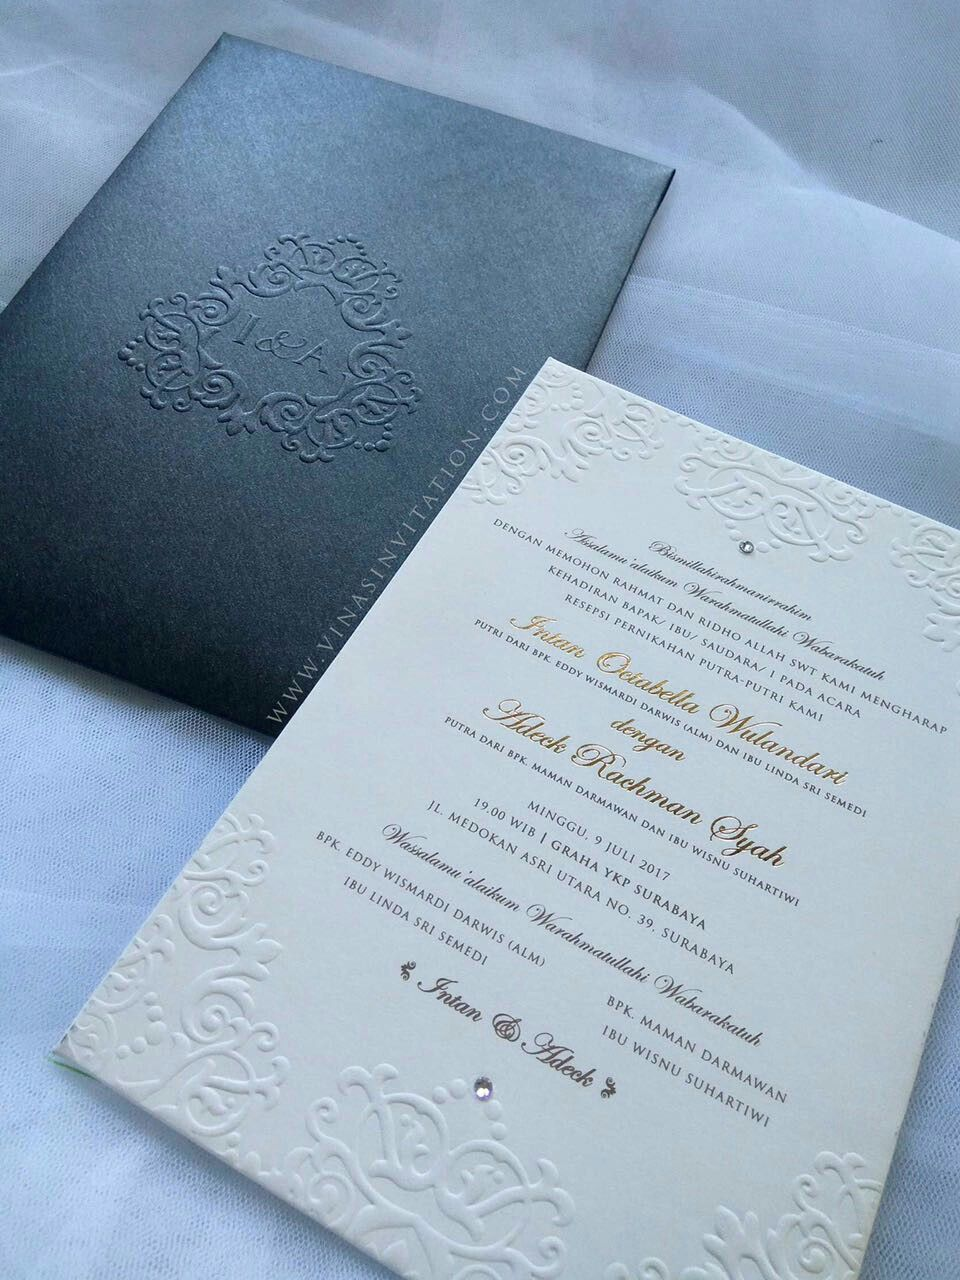 Vinas Invitation Emboss Invitation Royal Theme Emboss Font Gold Font Any Question Pls V Undangan Pernikahan Contoh Undangan Pernikahan Undangan Perkawinan